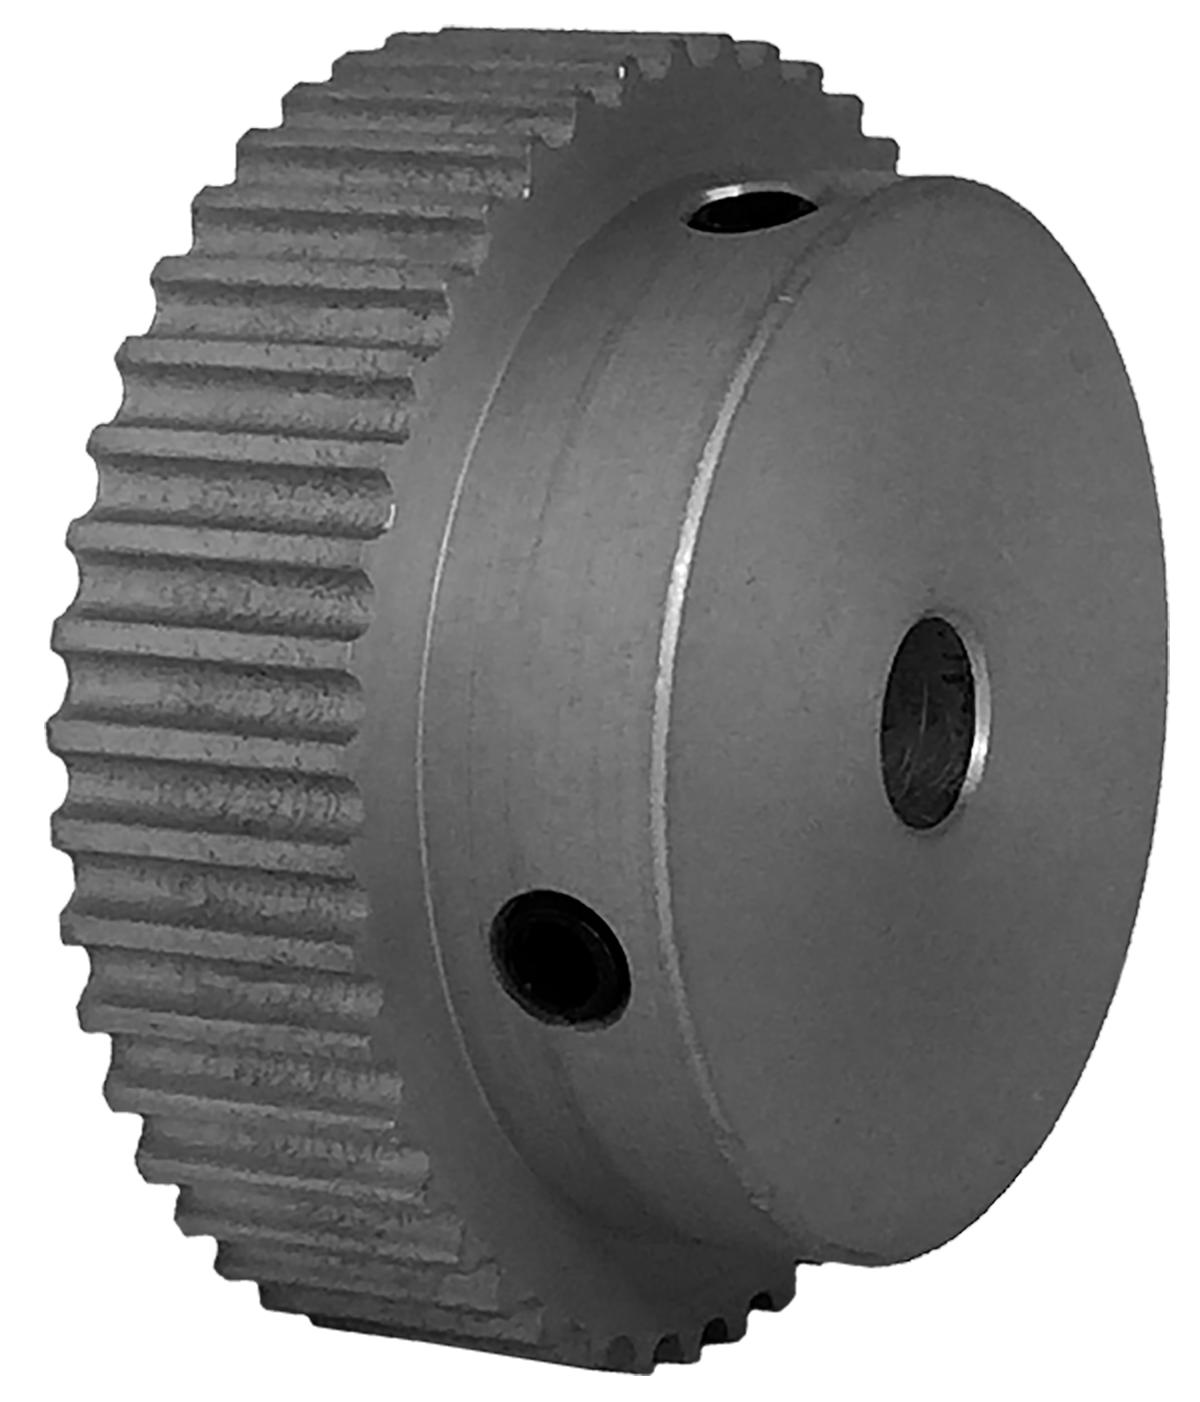 44-3P06-6A3 - Aluminum Powerhouse® Pulleys